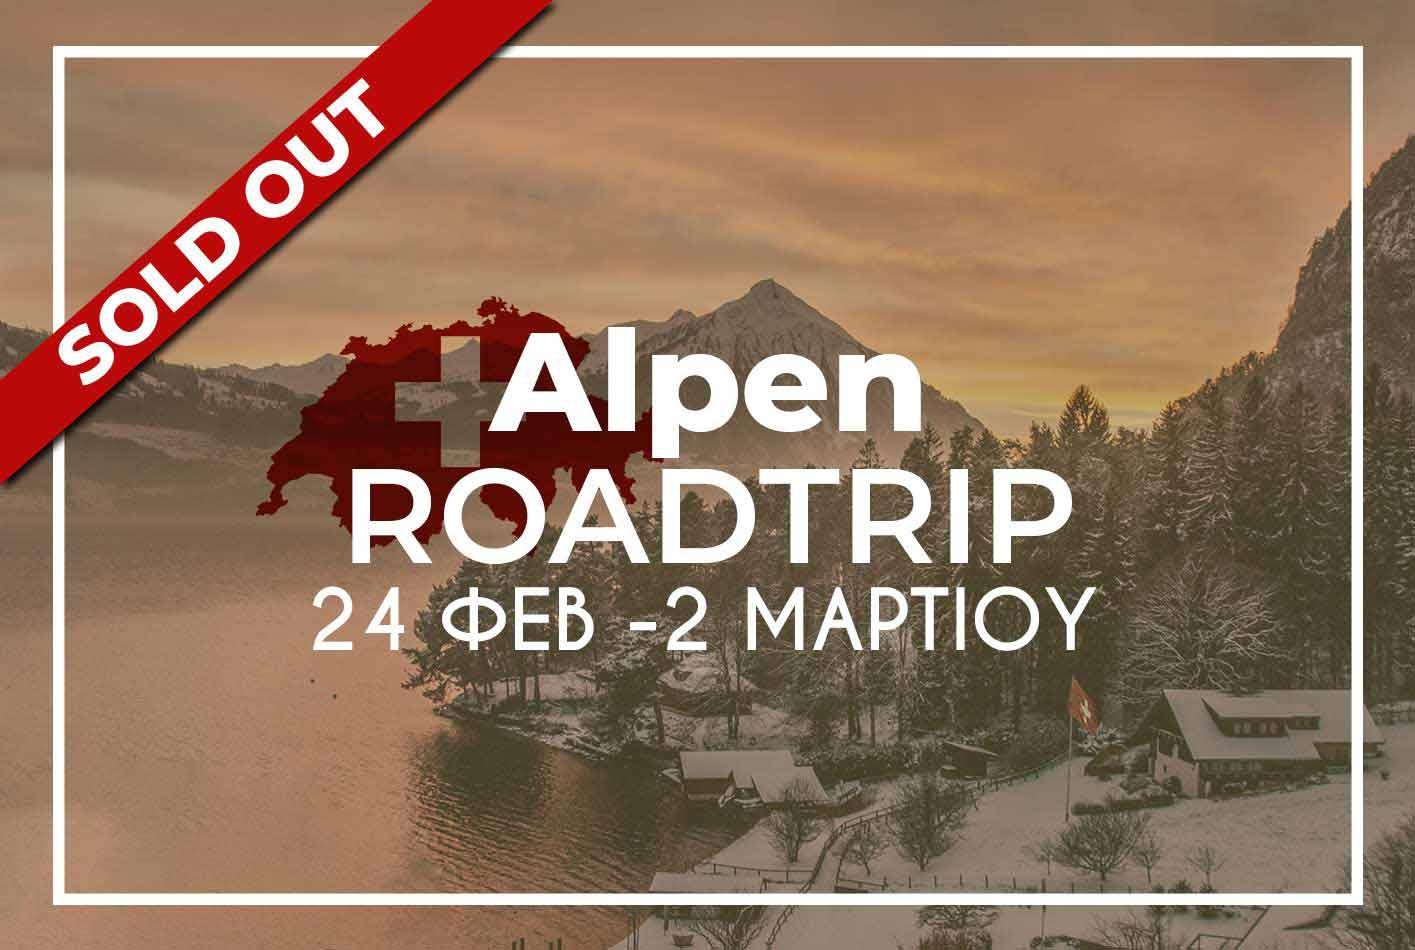 Alpen Roadtrip 24 Φεβρουαρίου - 2 Μαρτίου Sold out